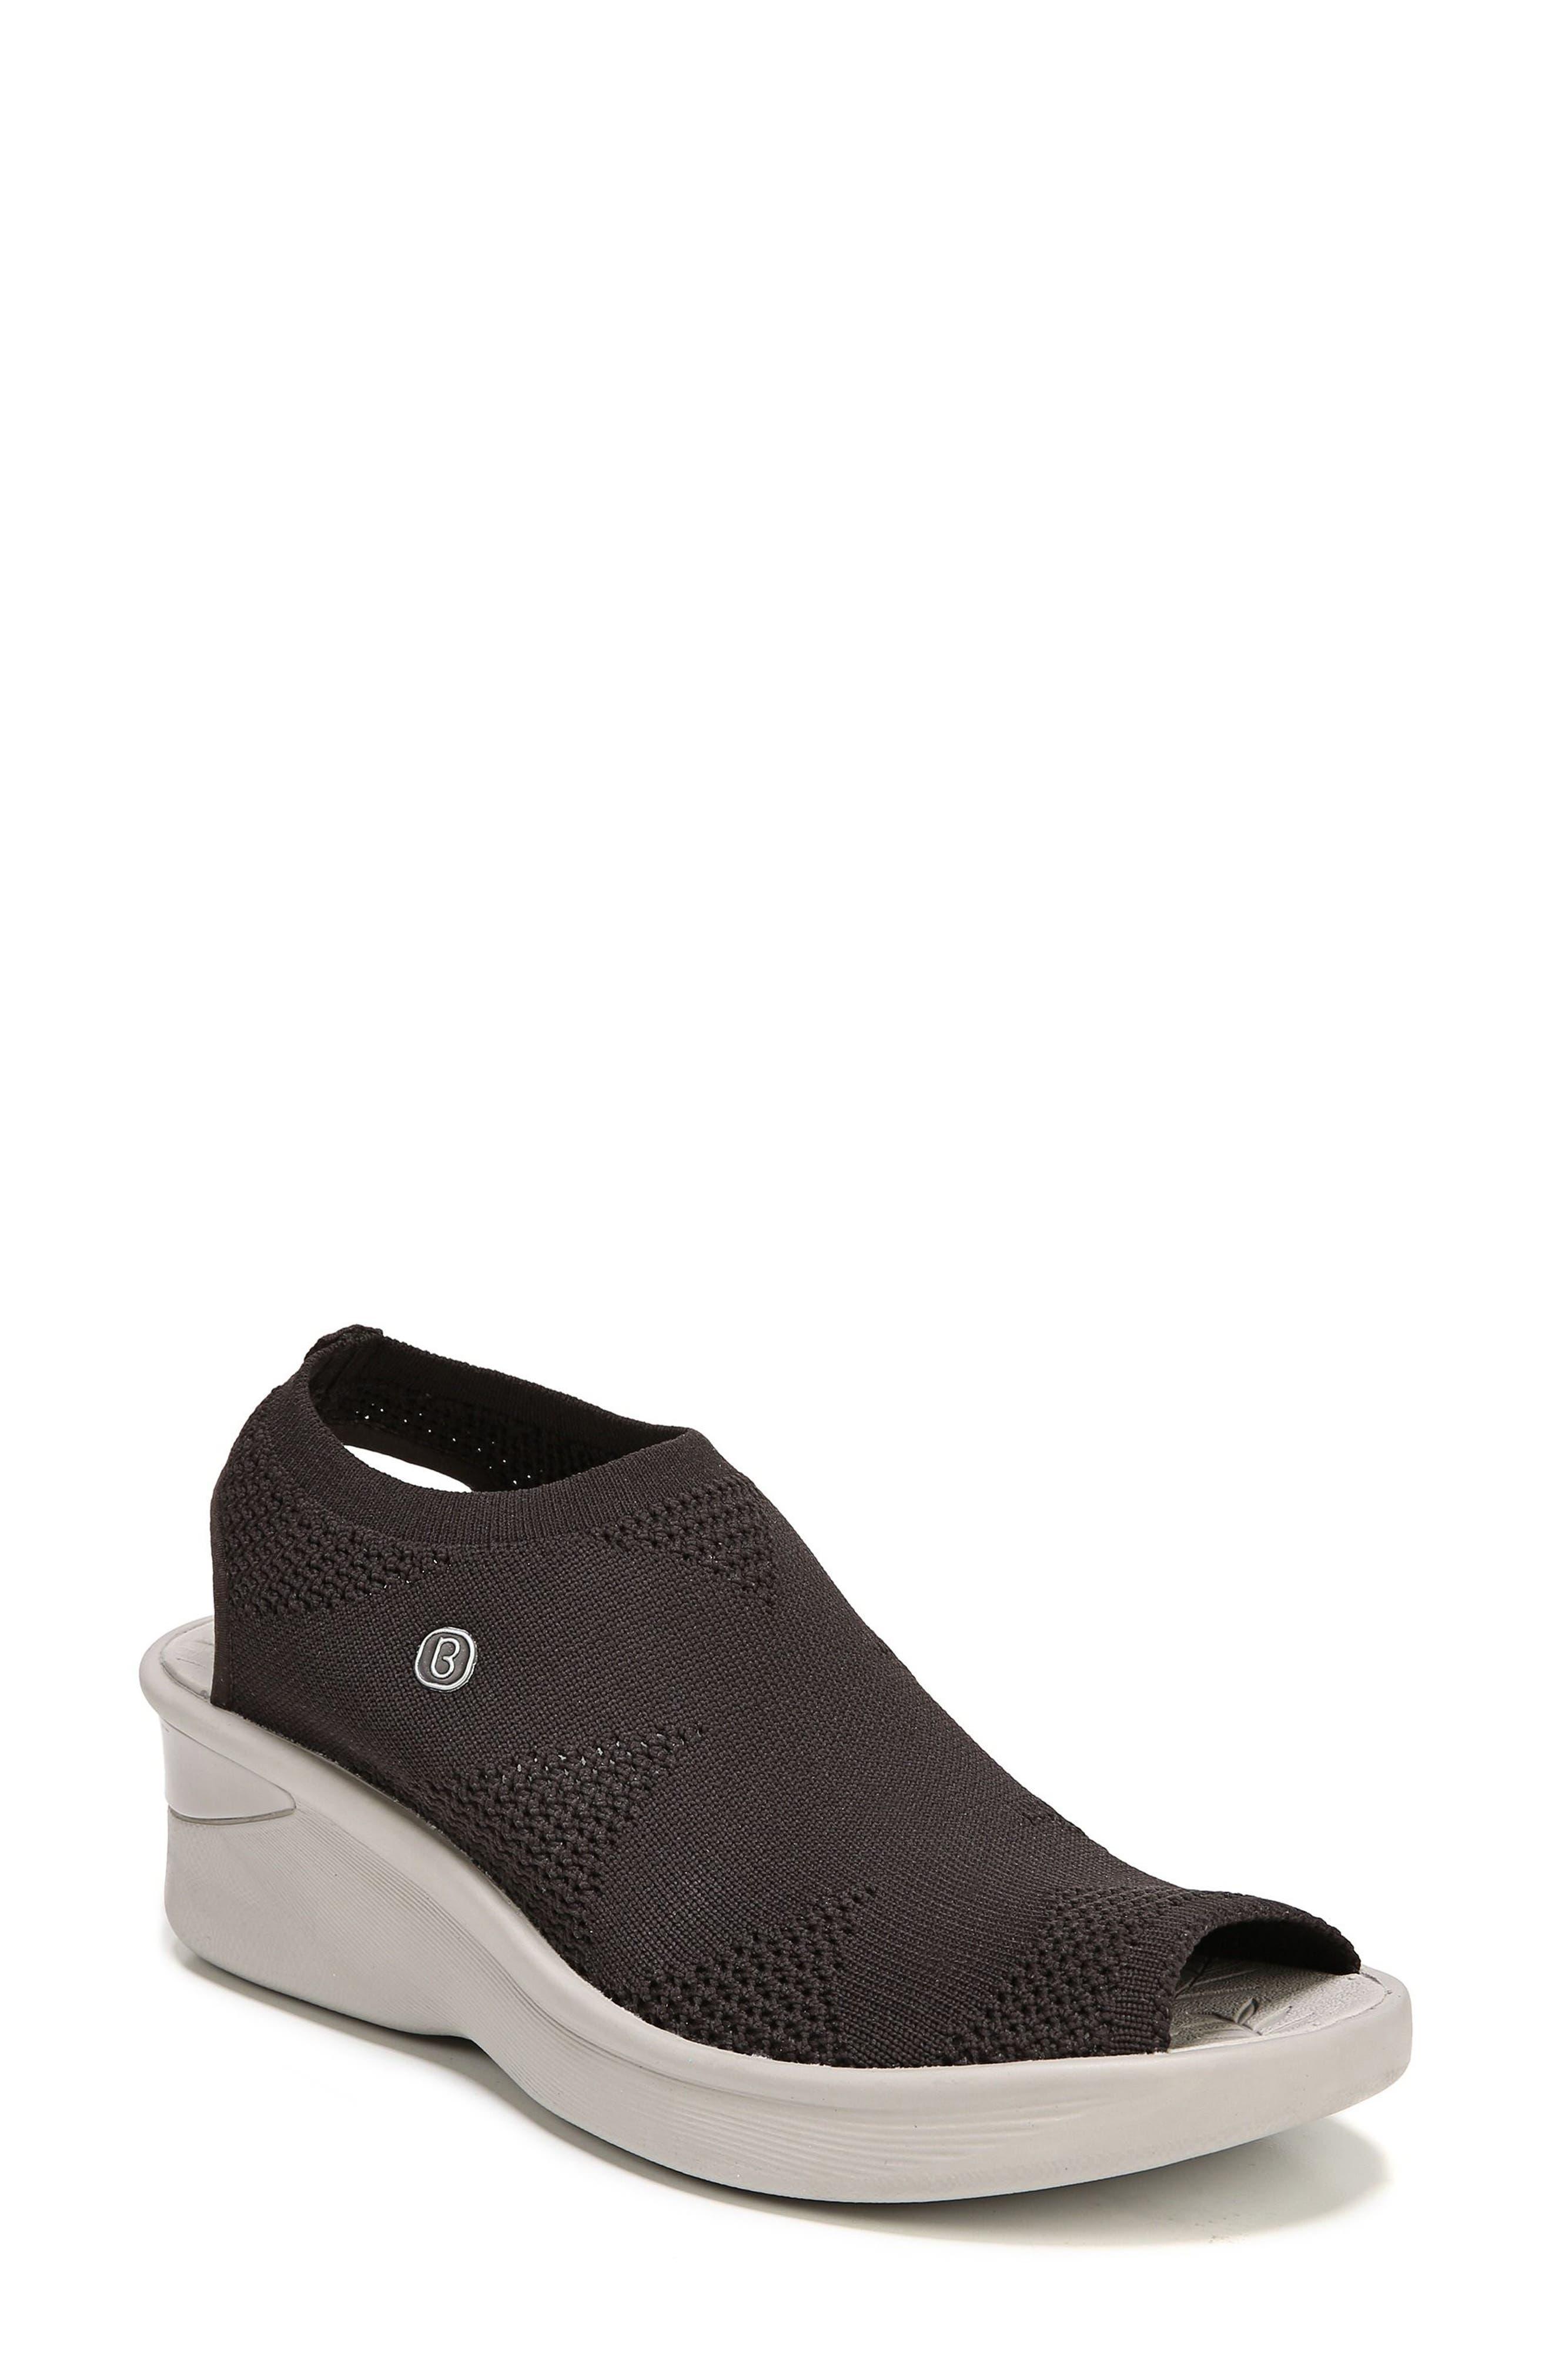 Secret Peep Toe Knit Sneaker,                             Main thumbnail 1, color,                             BROWN FABRIC